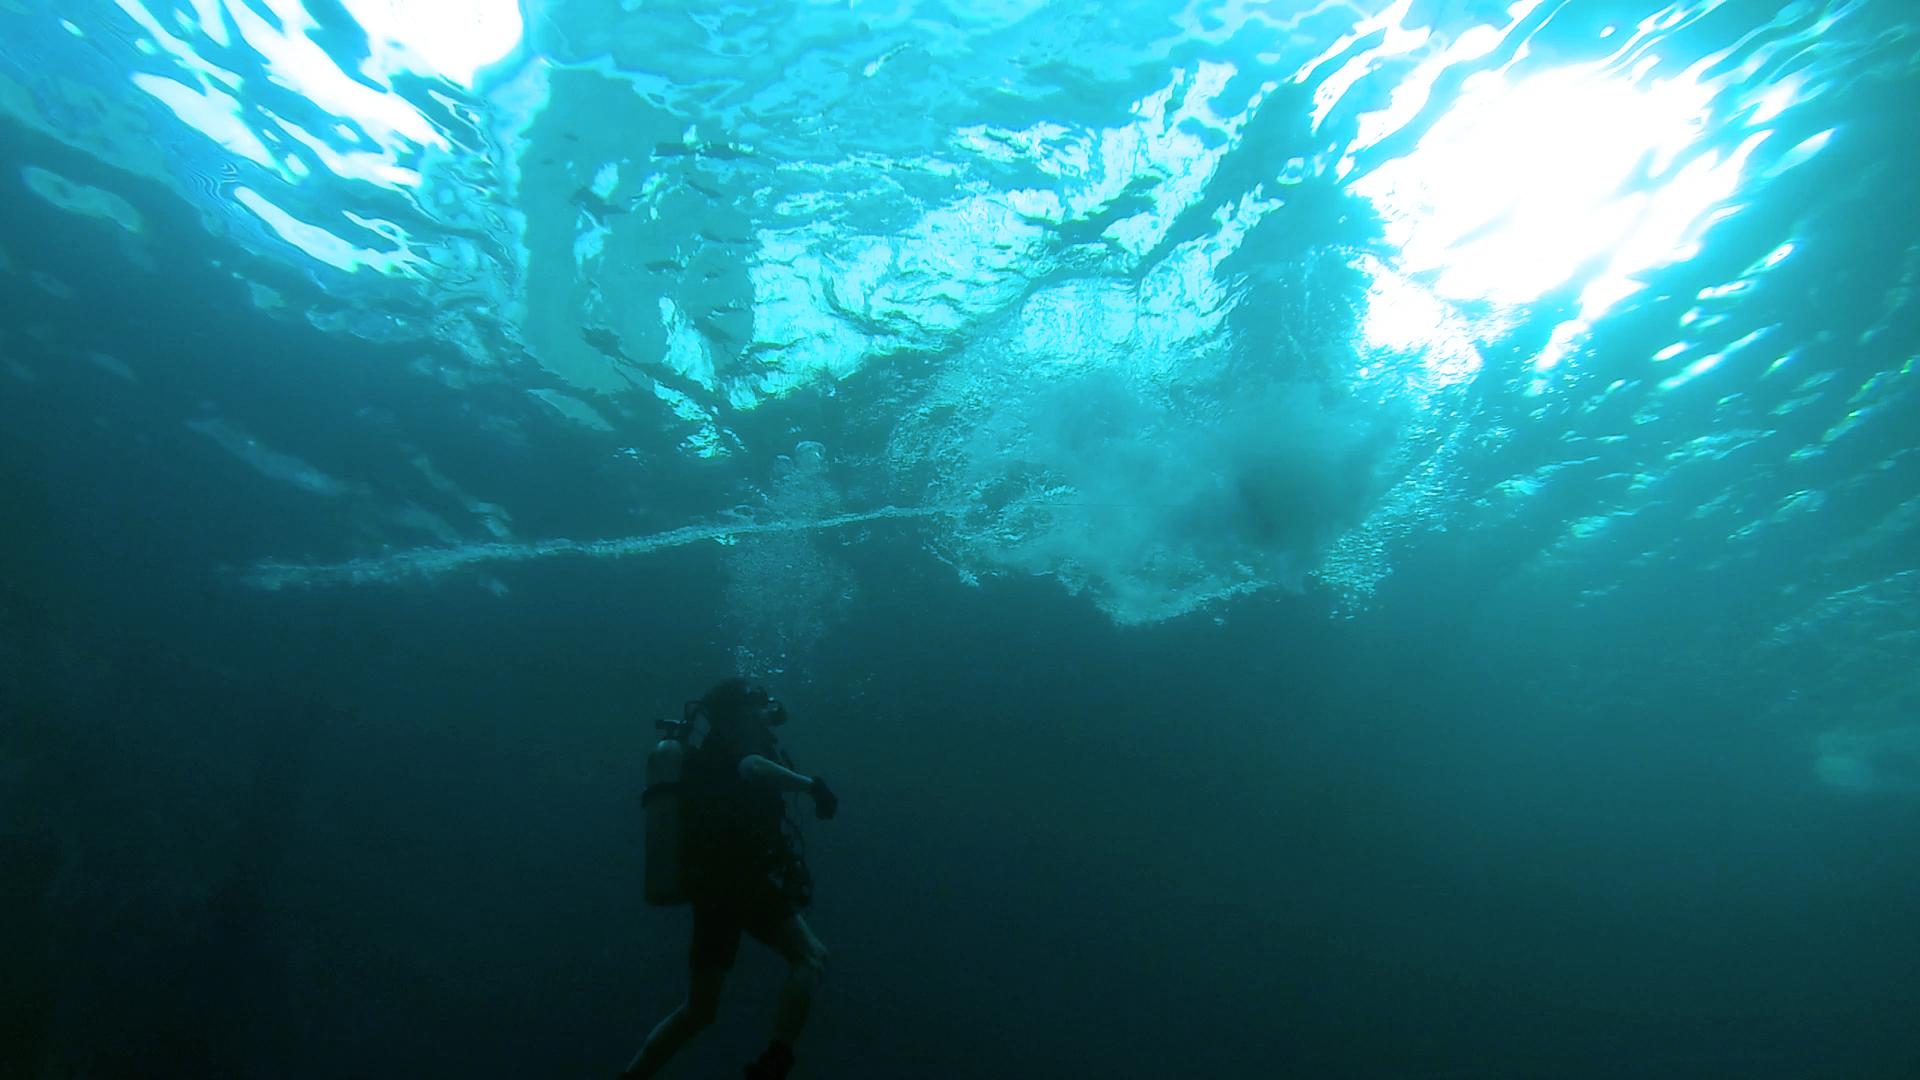 MG Action, Martin Goeres, Stuntperformer, Diving, Taucher